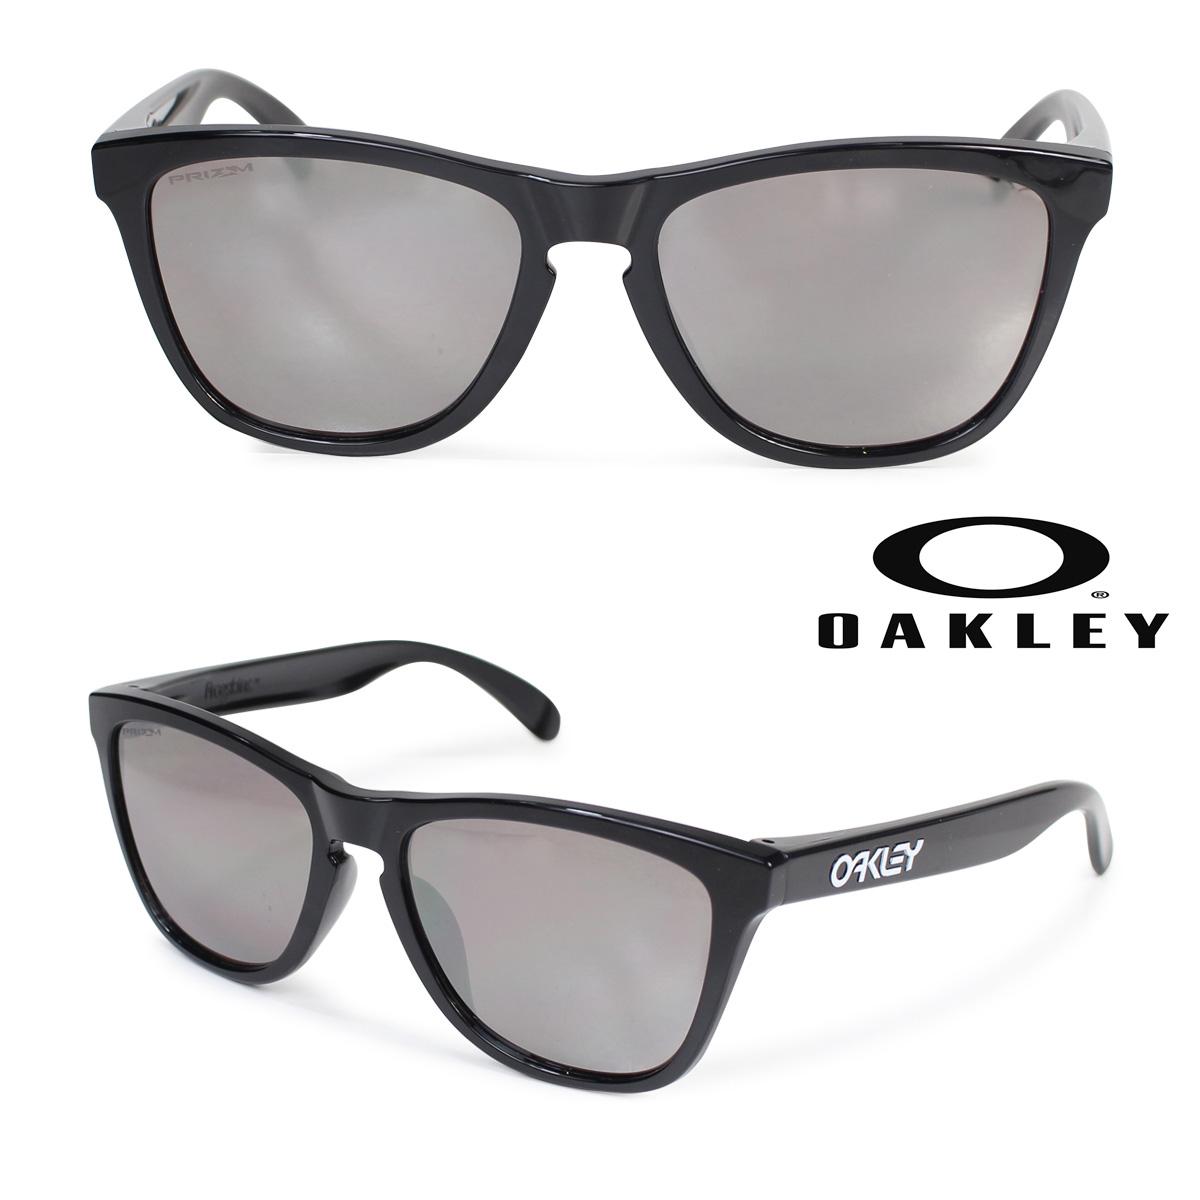 Oakley サングラス アジアンフィット オークリー Frogskins フロッグスキン ASIA FIT OO9245-62 メンズ レディース